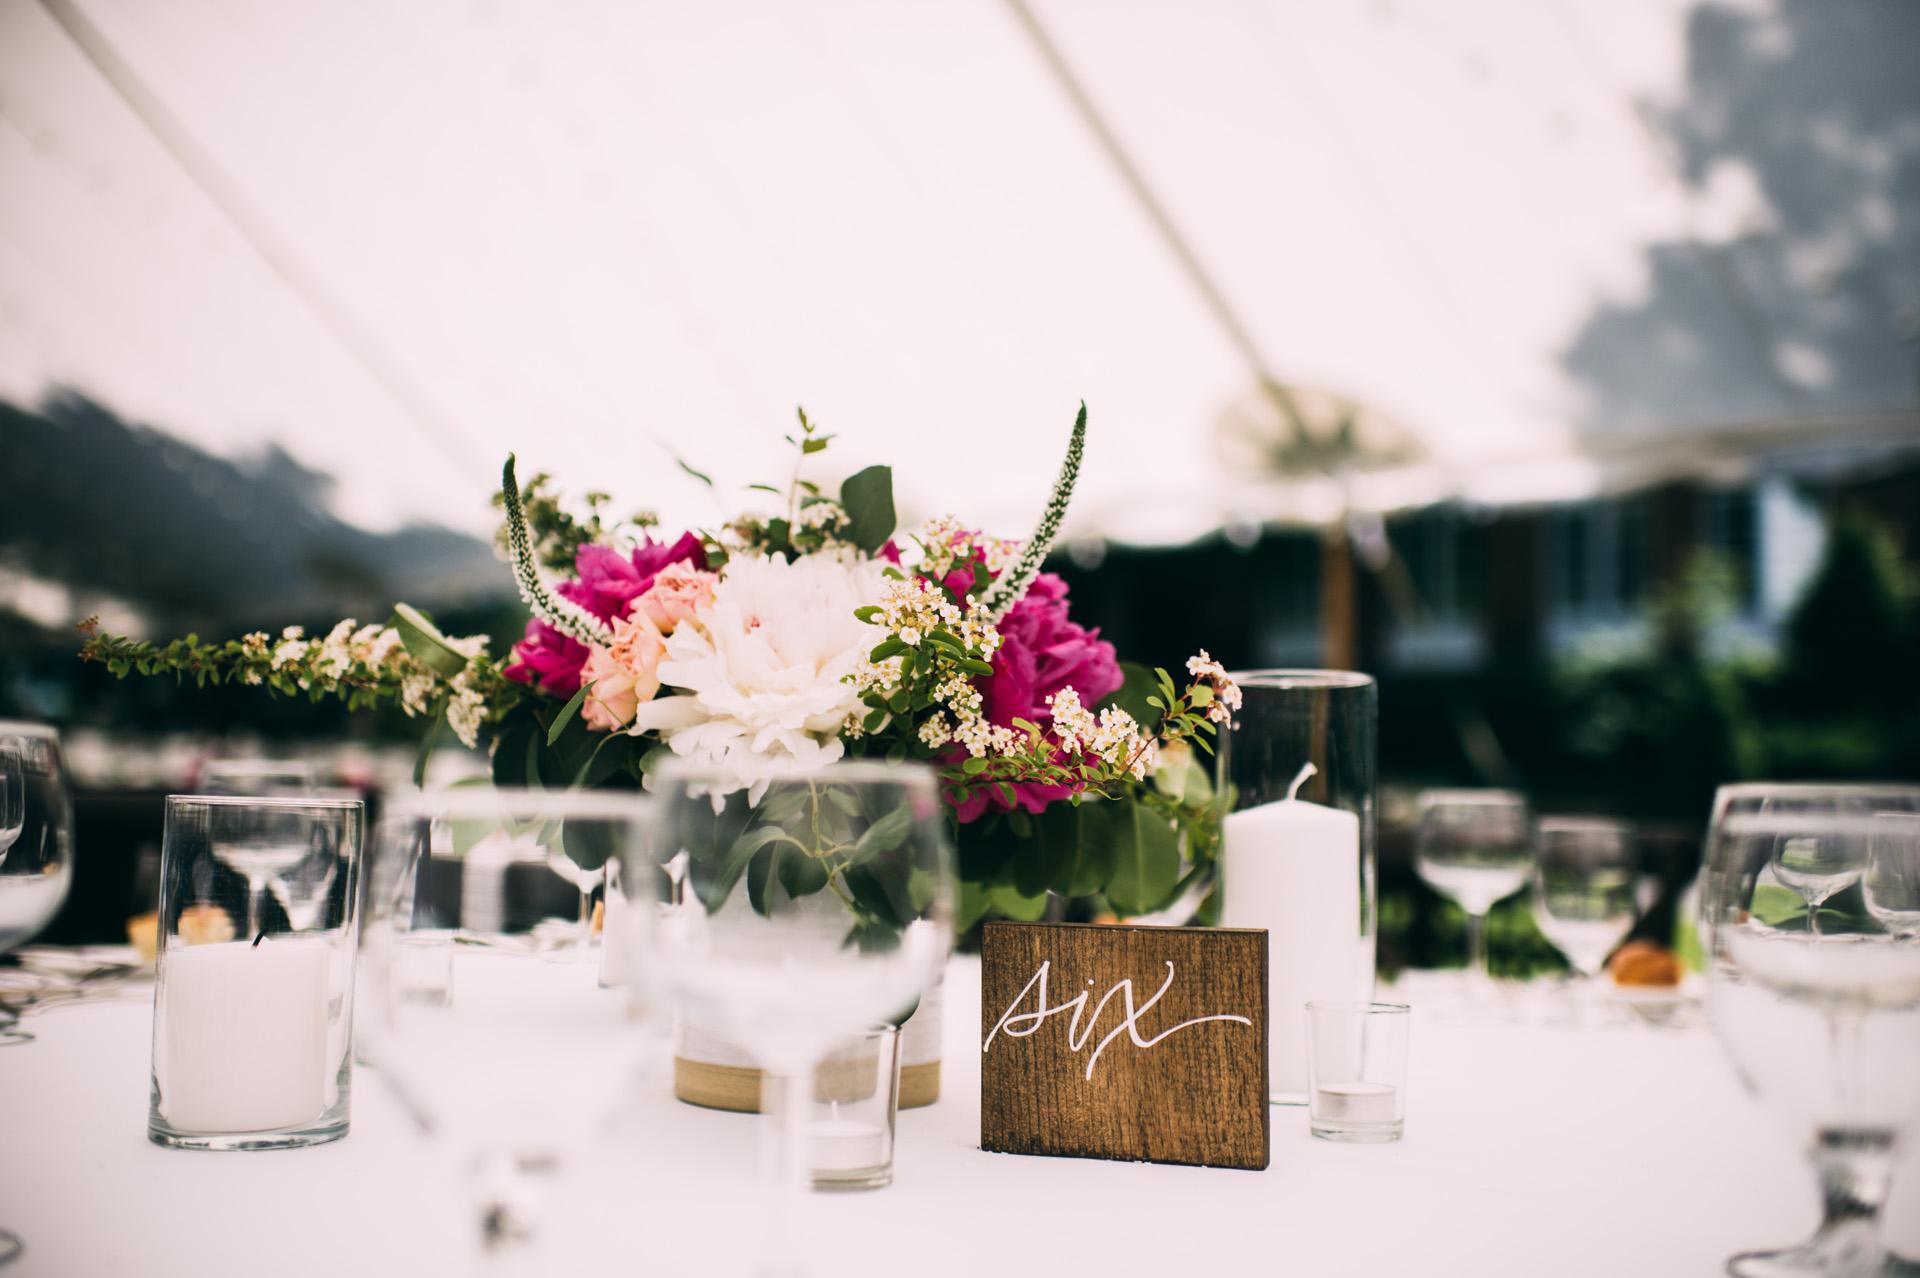 woodstock-inn-vermont-wedding-22